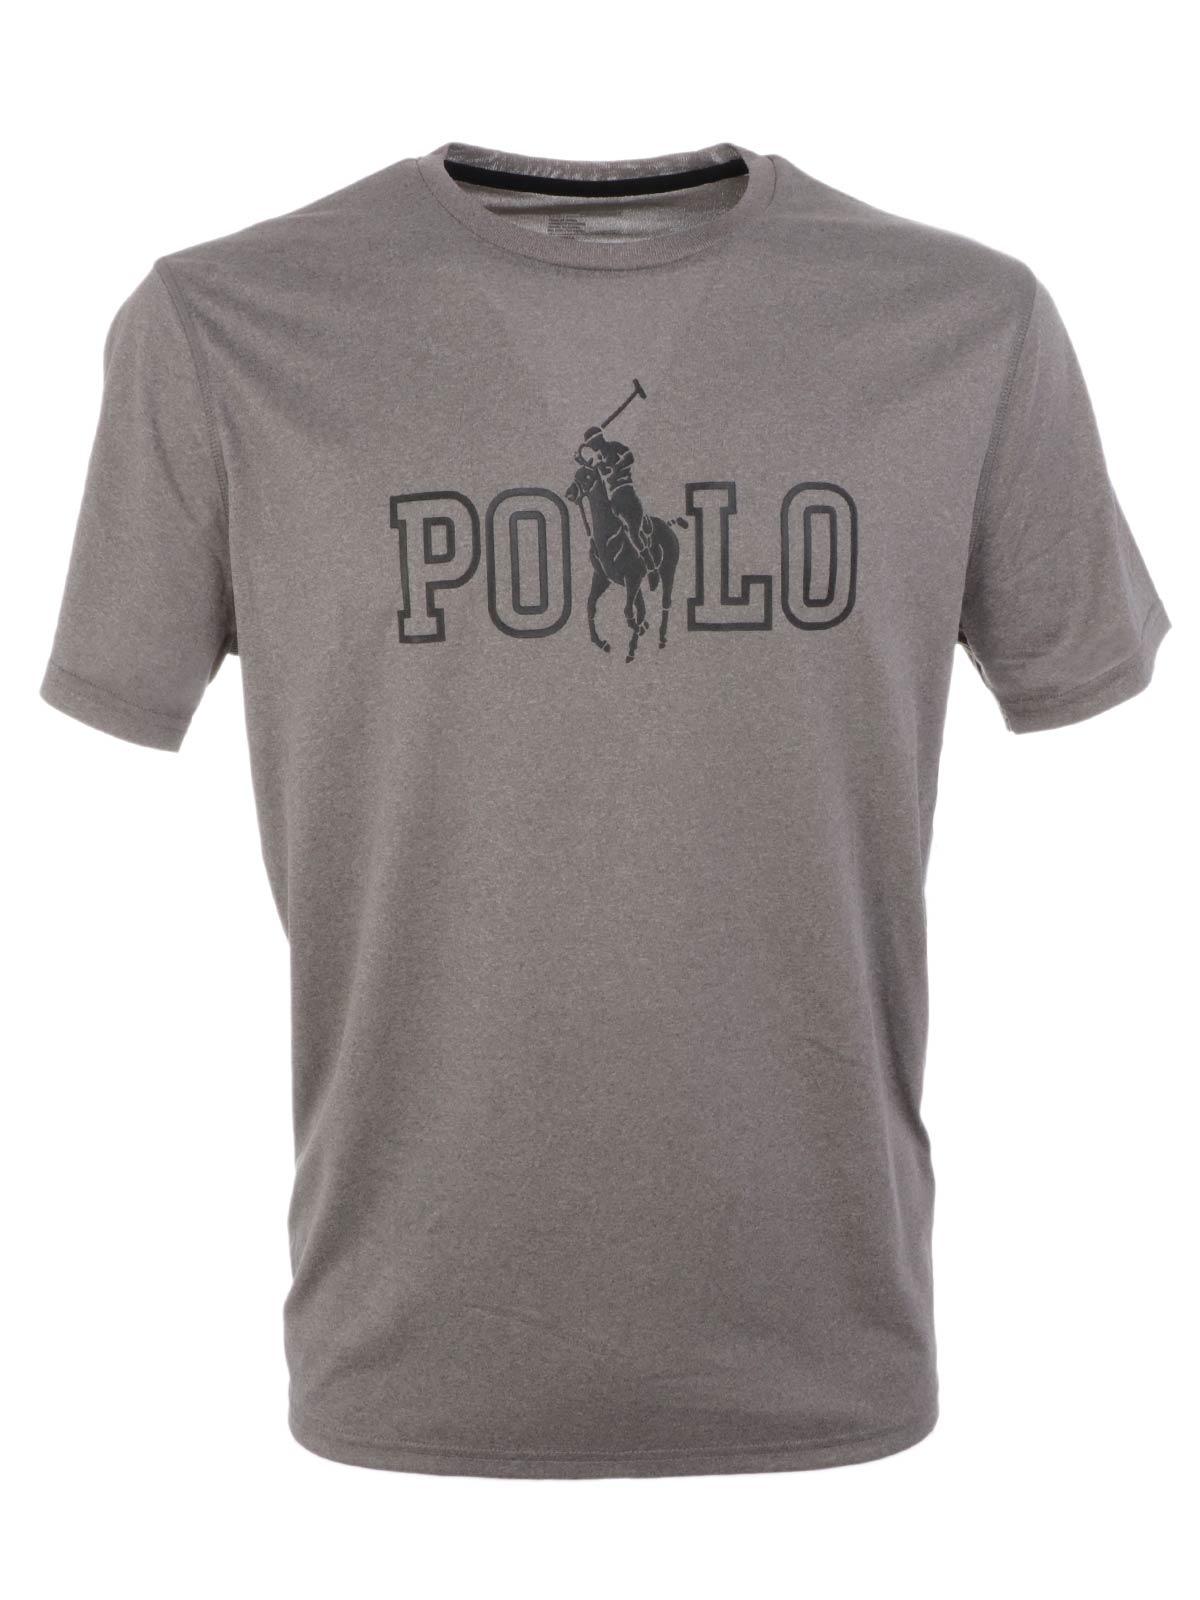 Immagine di POLO RALPH LAUREN | T-shirt Uomo